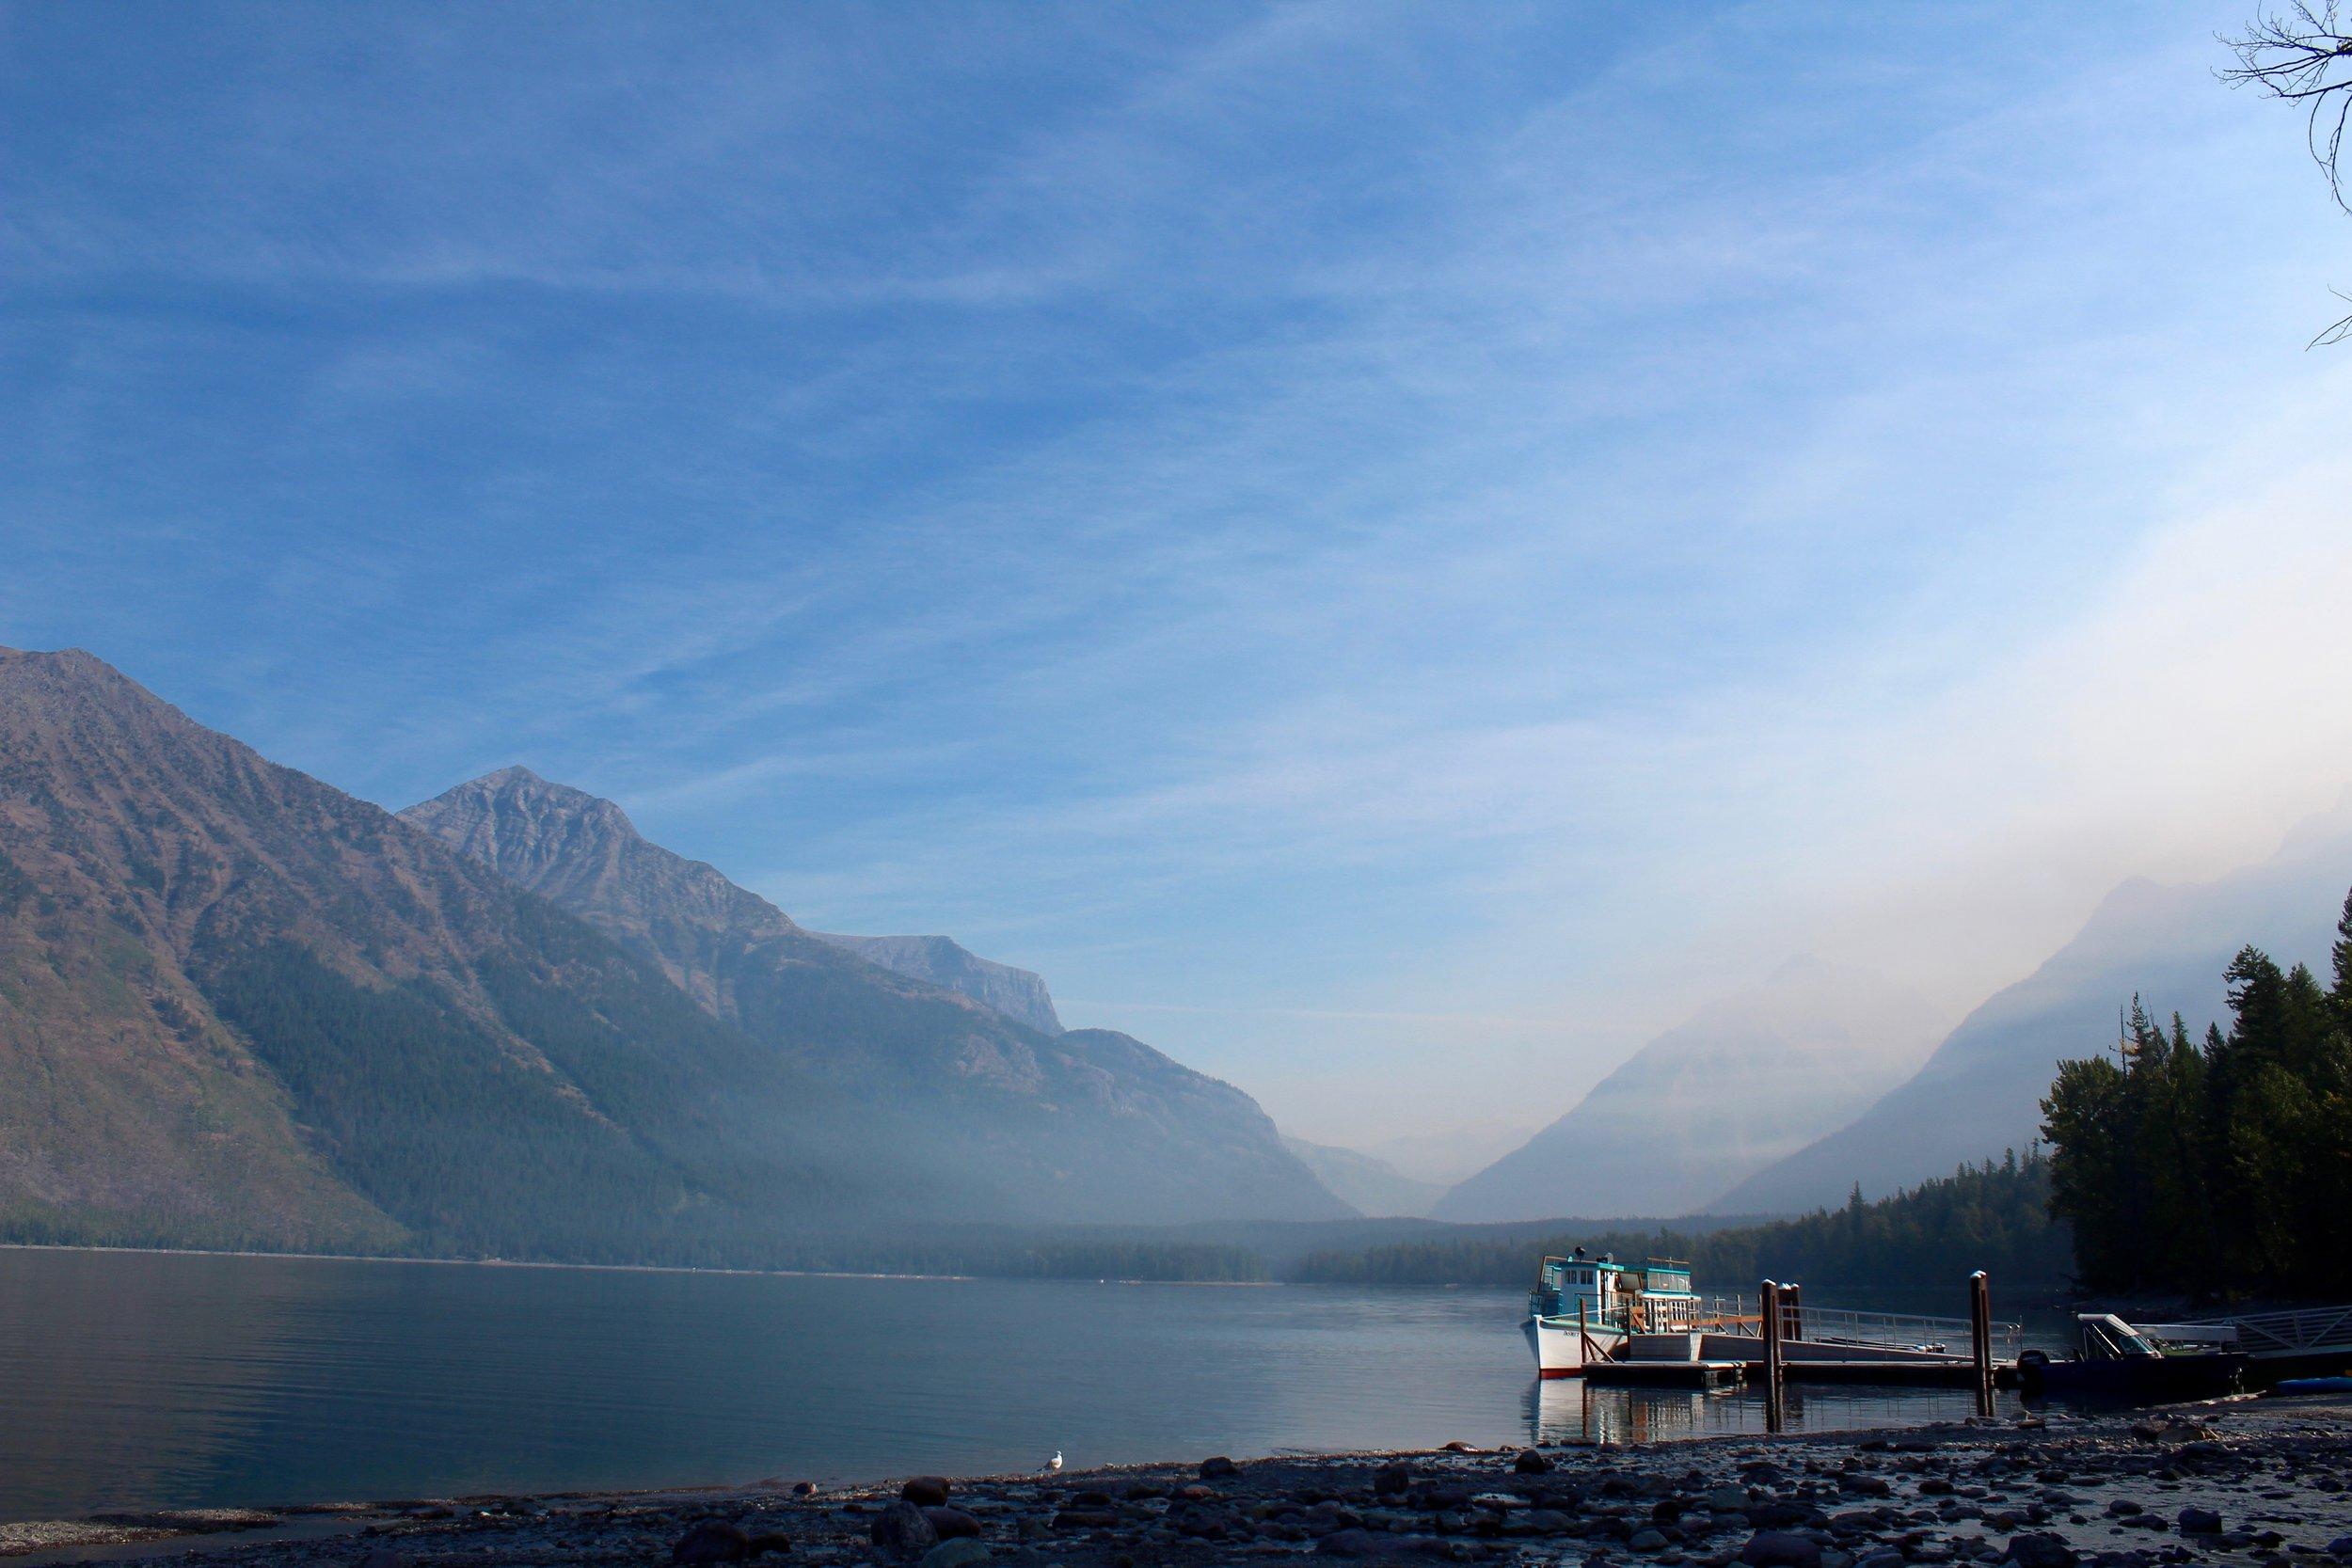 Montana Lake View